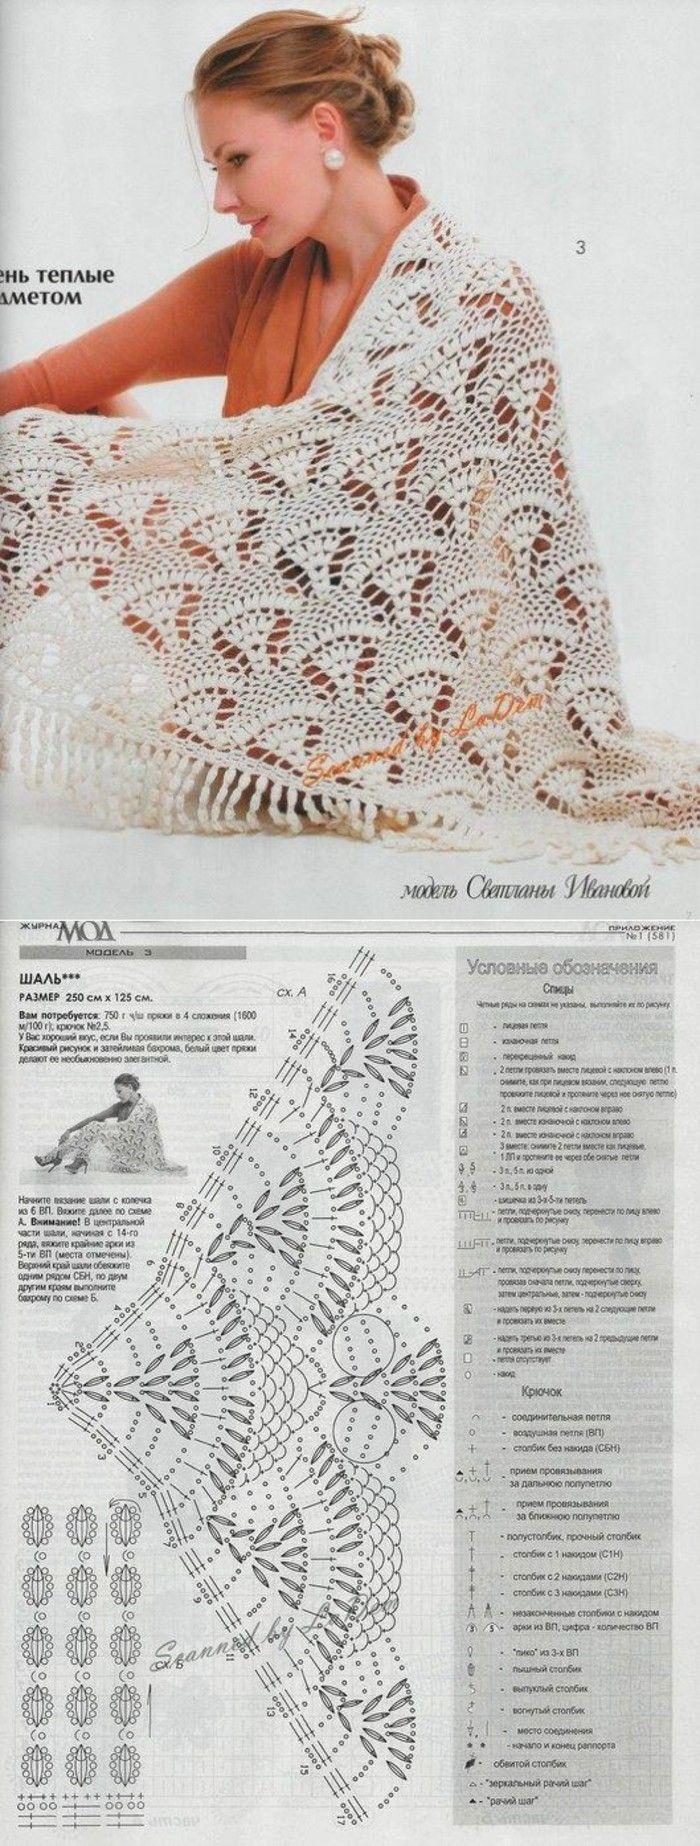 Chal con detalles blancos | adult | Pinterest | Chal, Blanco y Ganchillo